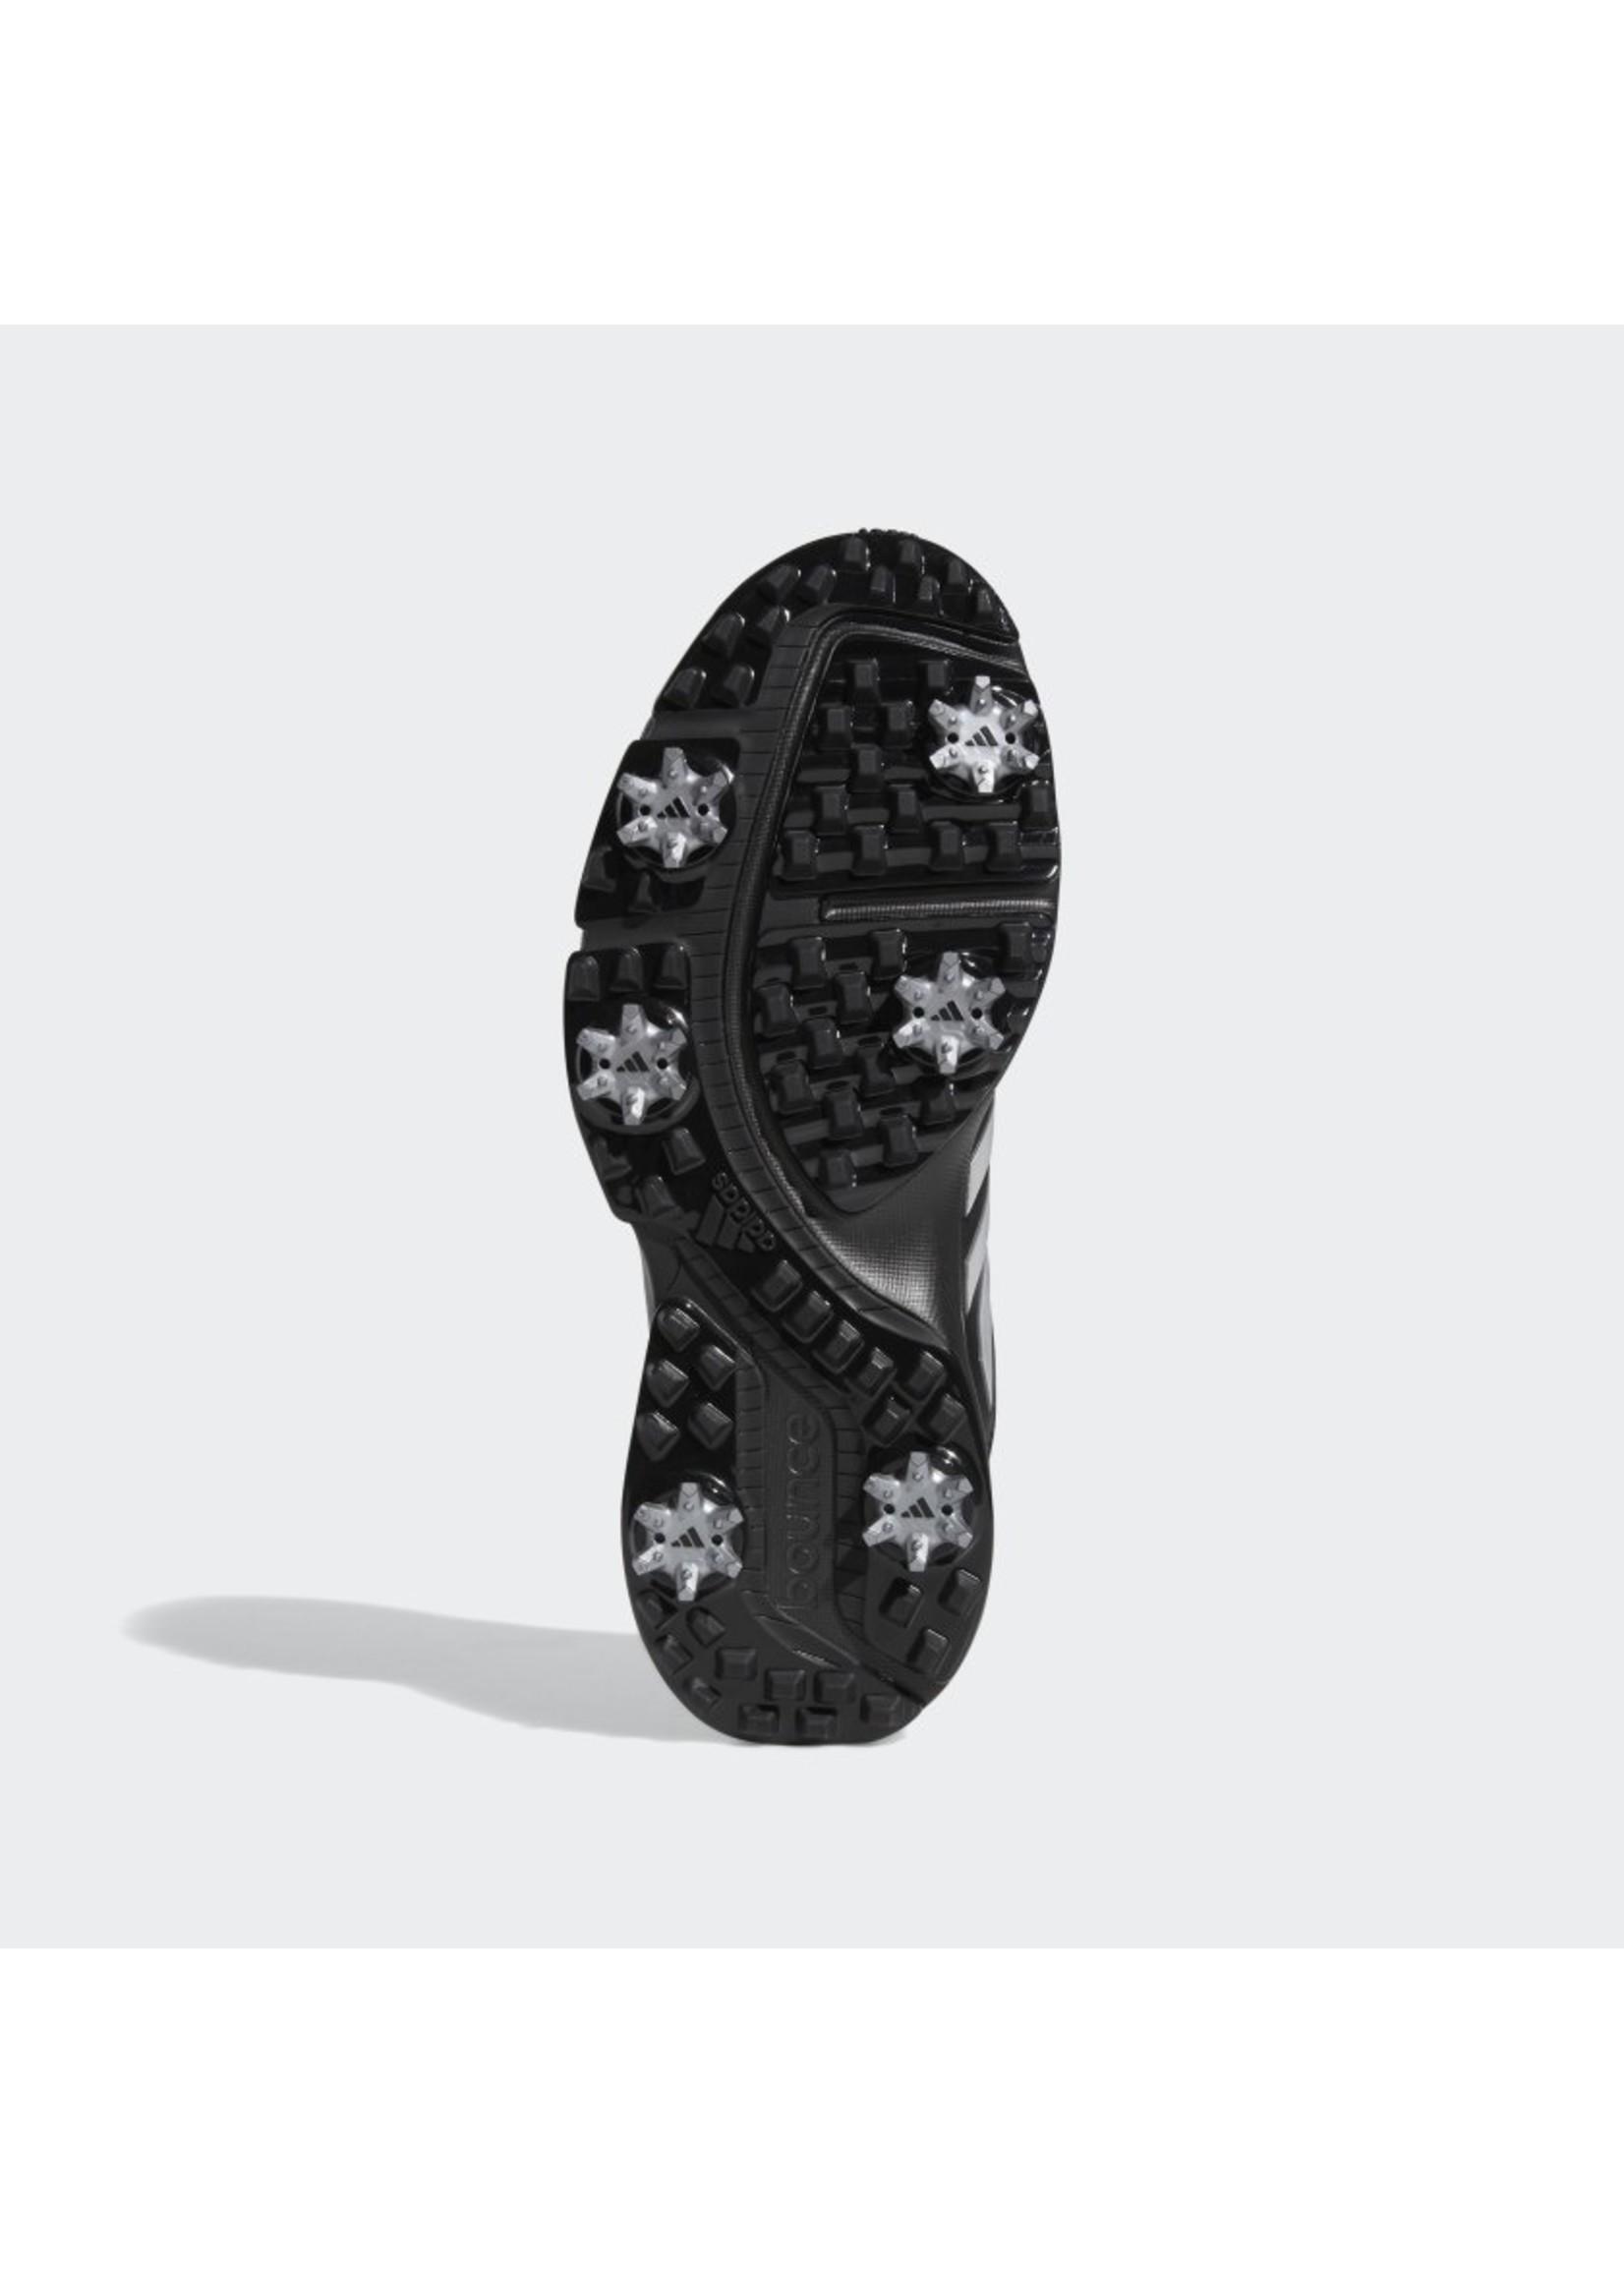 Adidas Adidas 360 Bounce II Mens Golf Shoe (2020), Black